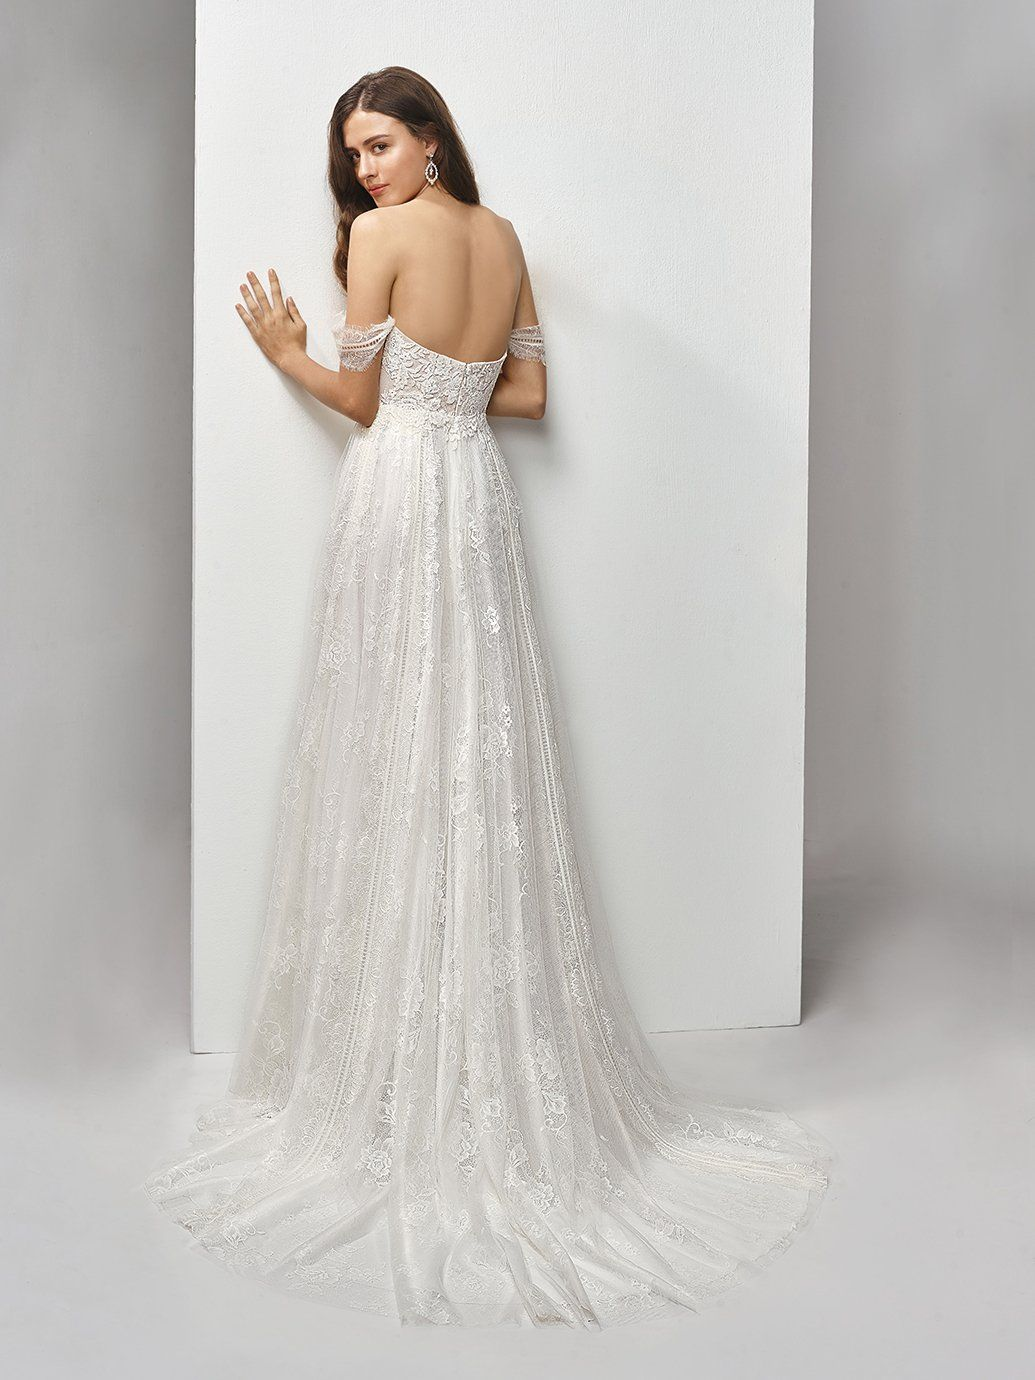 a15e55ff2da5 DANIFA 2019 brudekjole - Panayotis